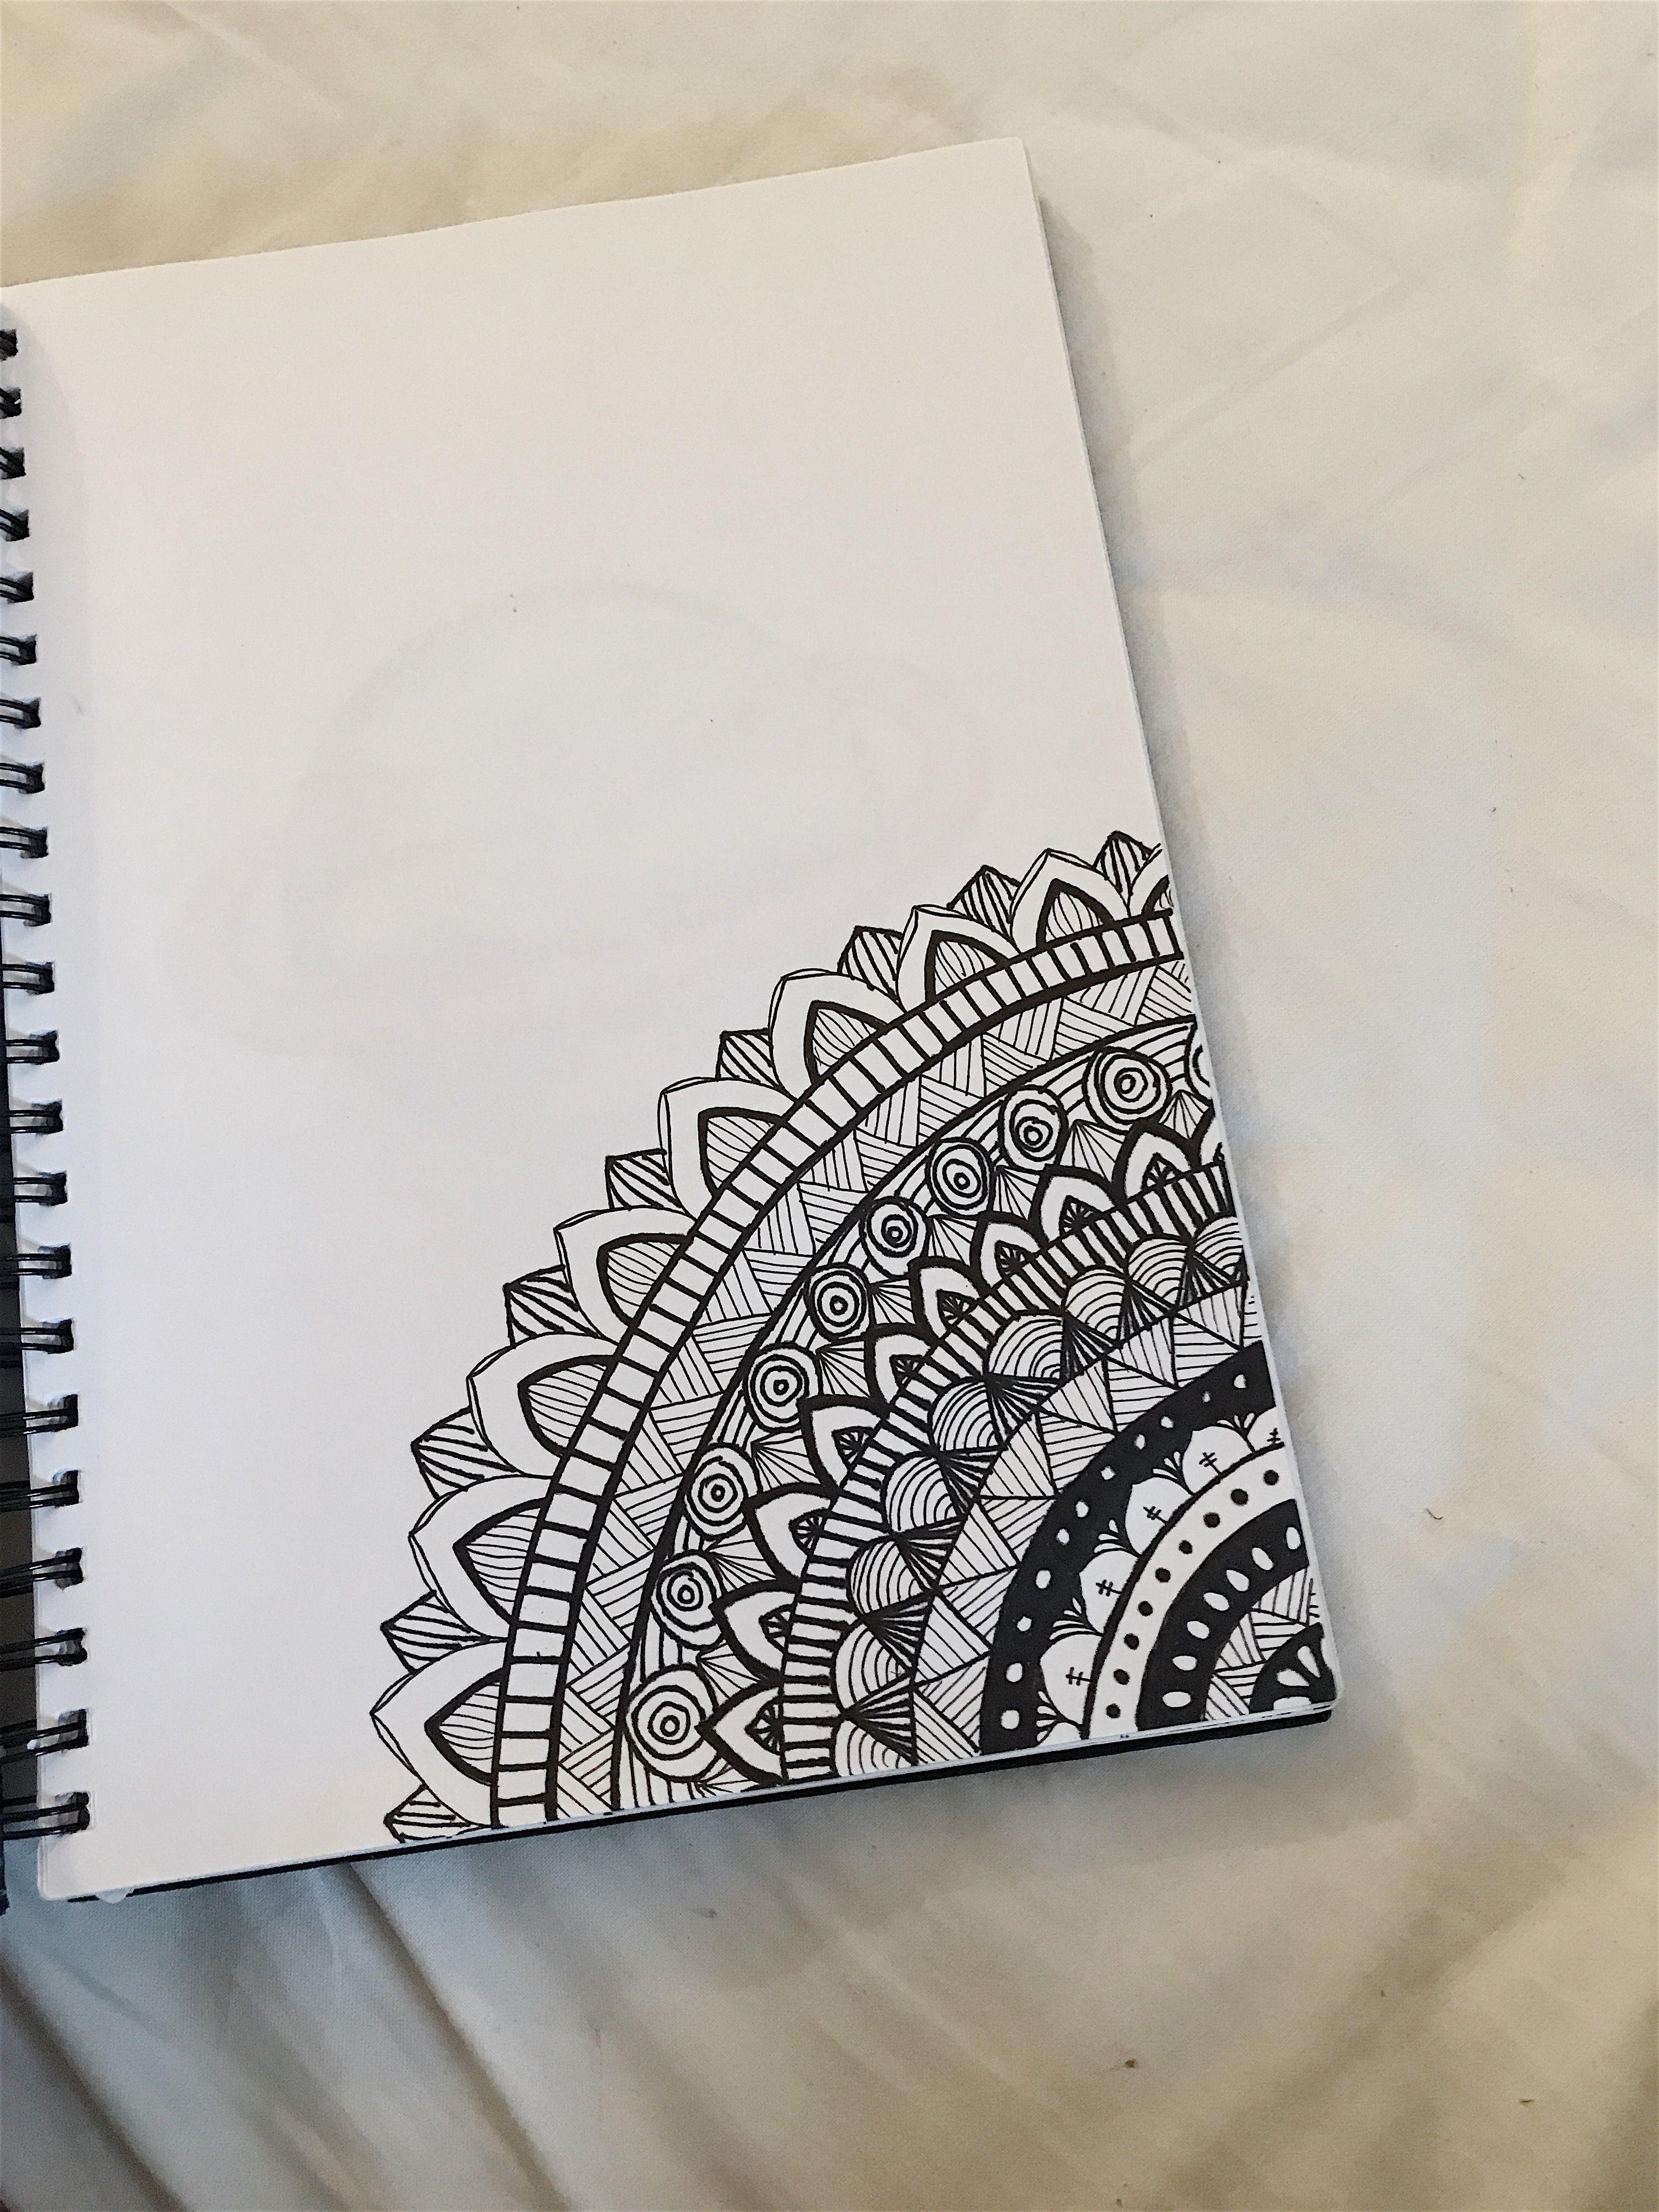 3024x4032 Drawing